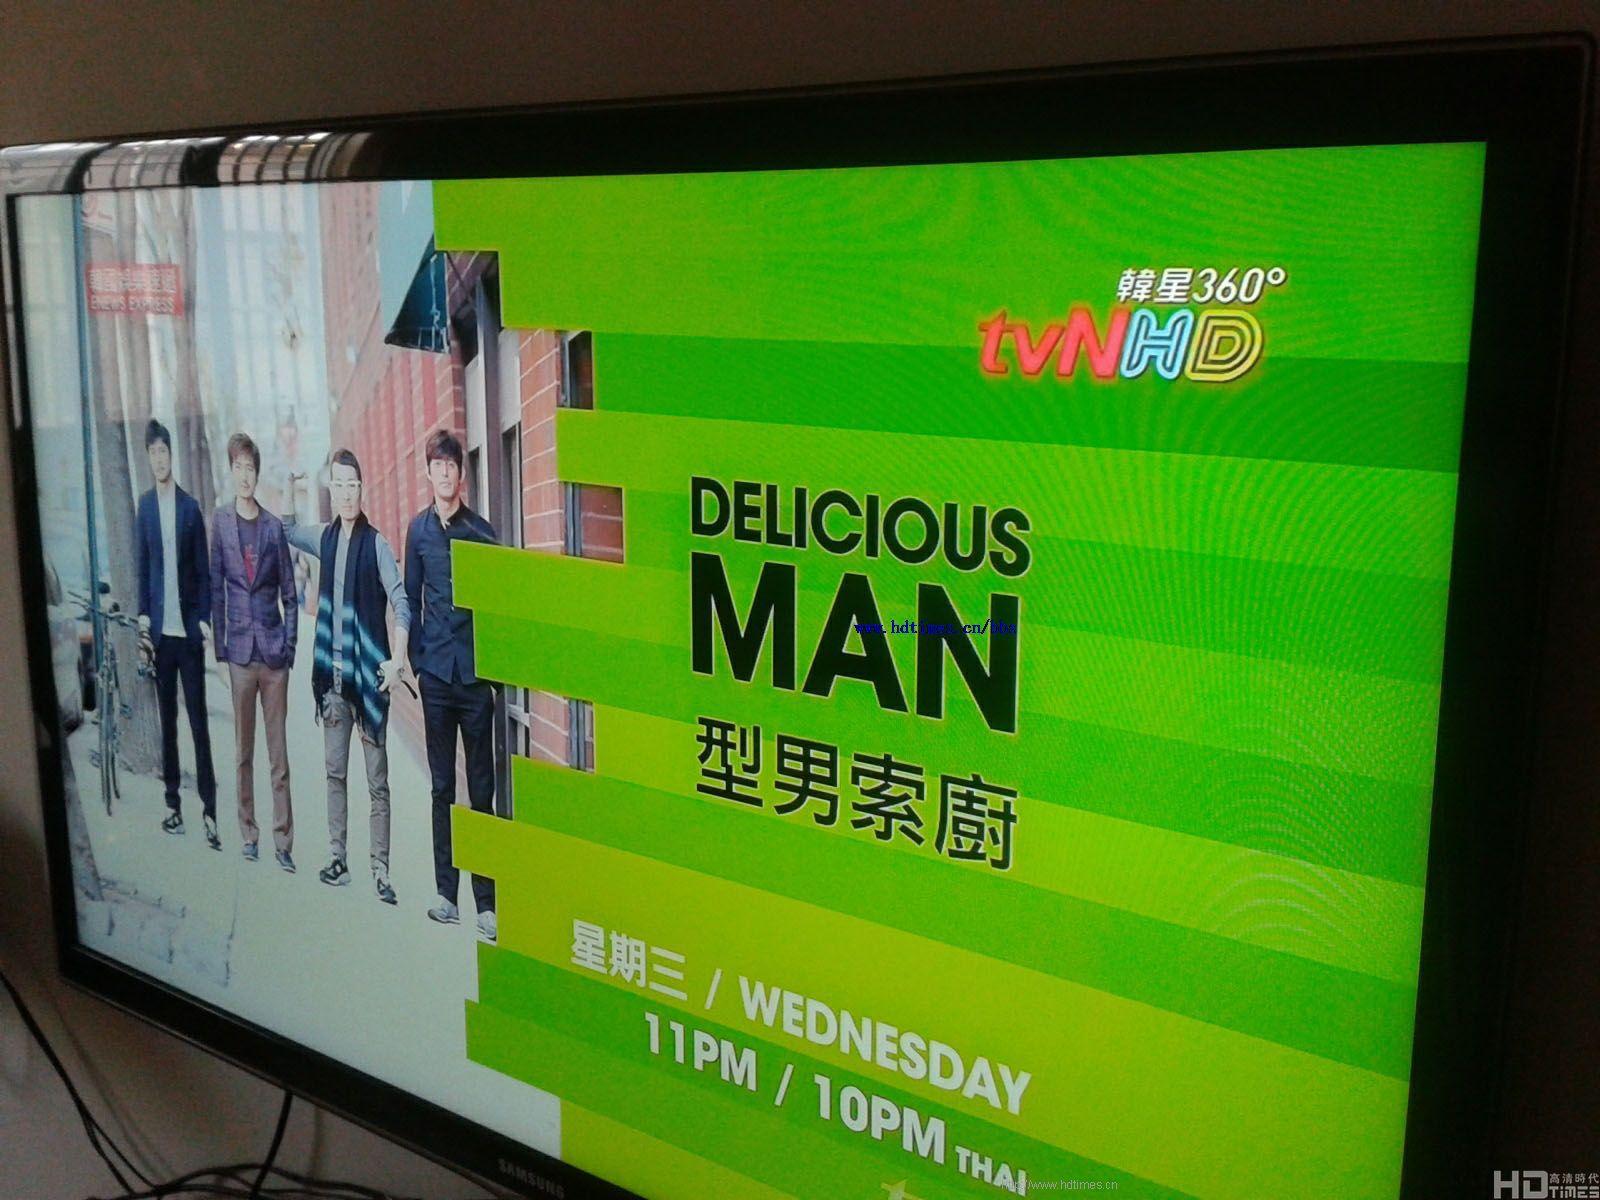 DISH-HD 新增Tvn-HD高清韩国娱乐频道